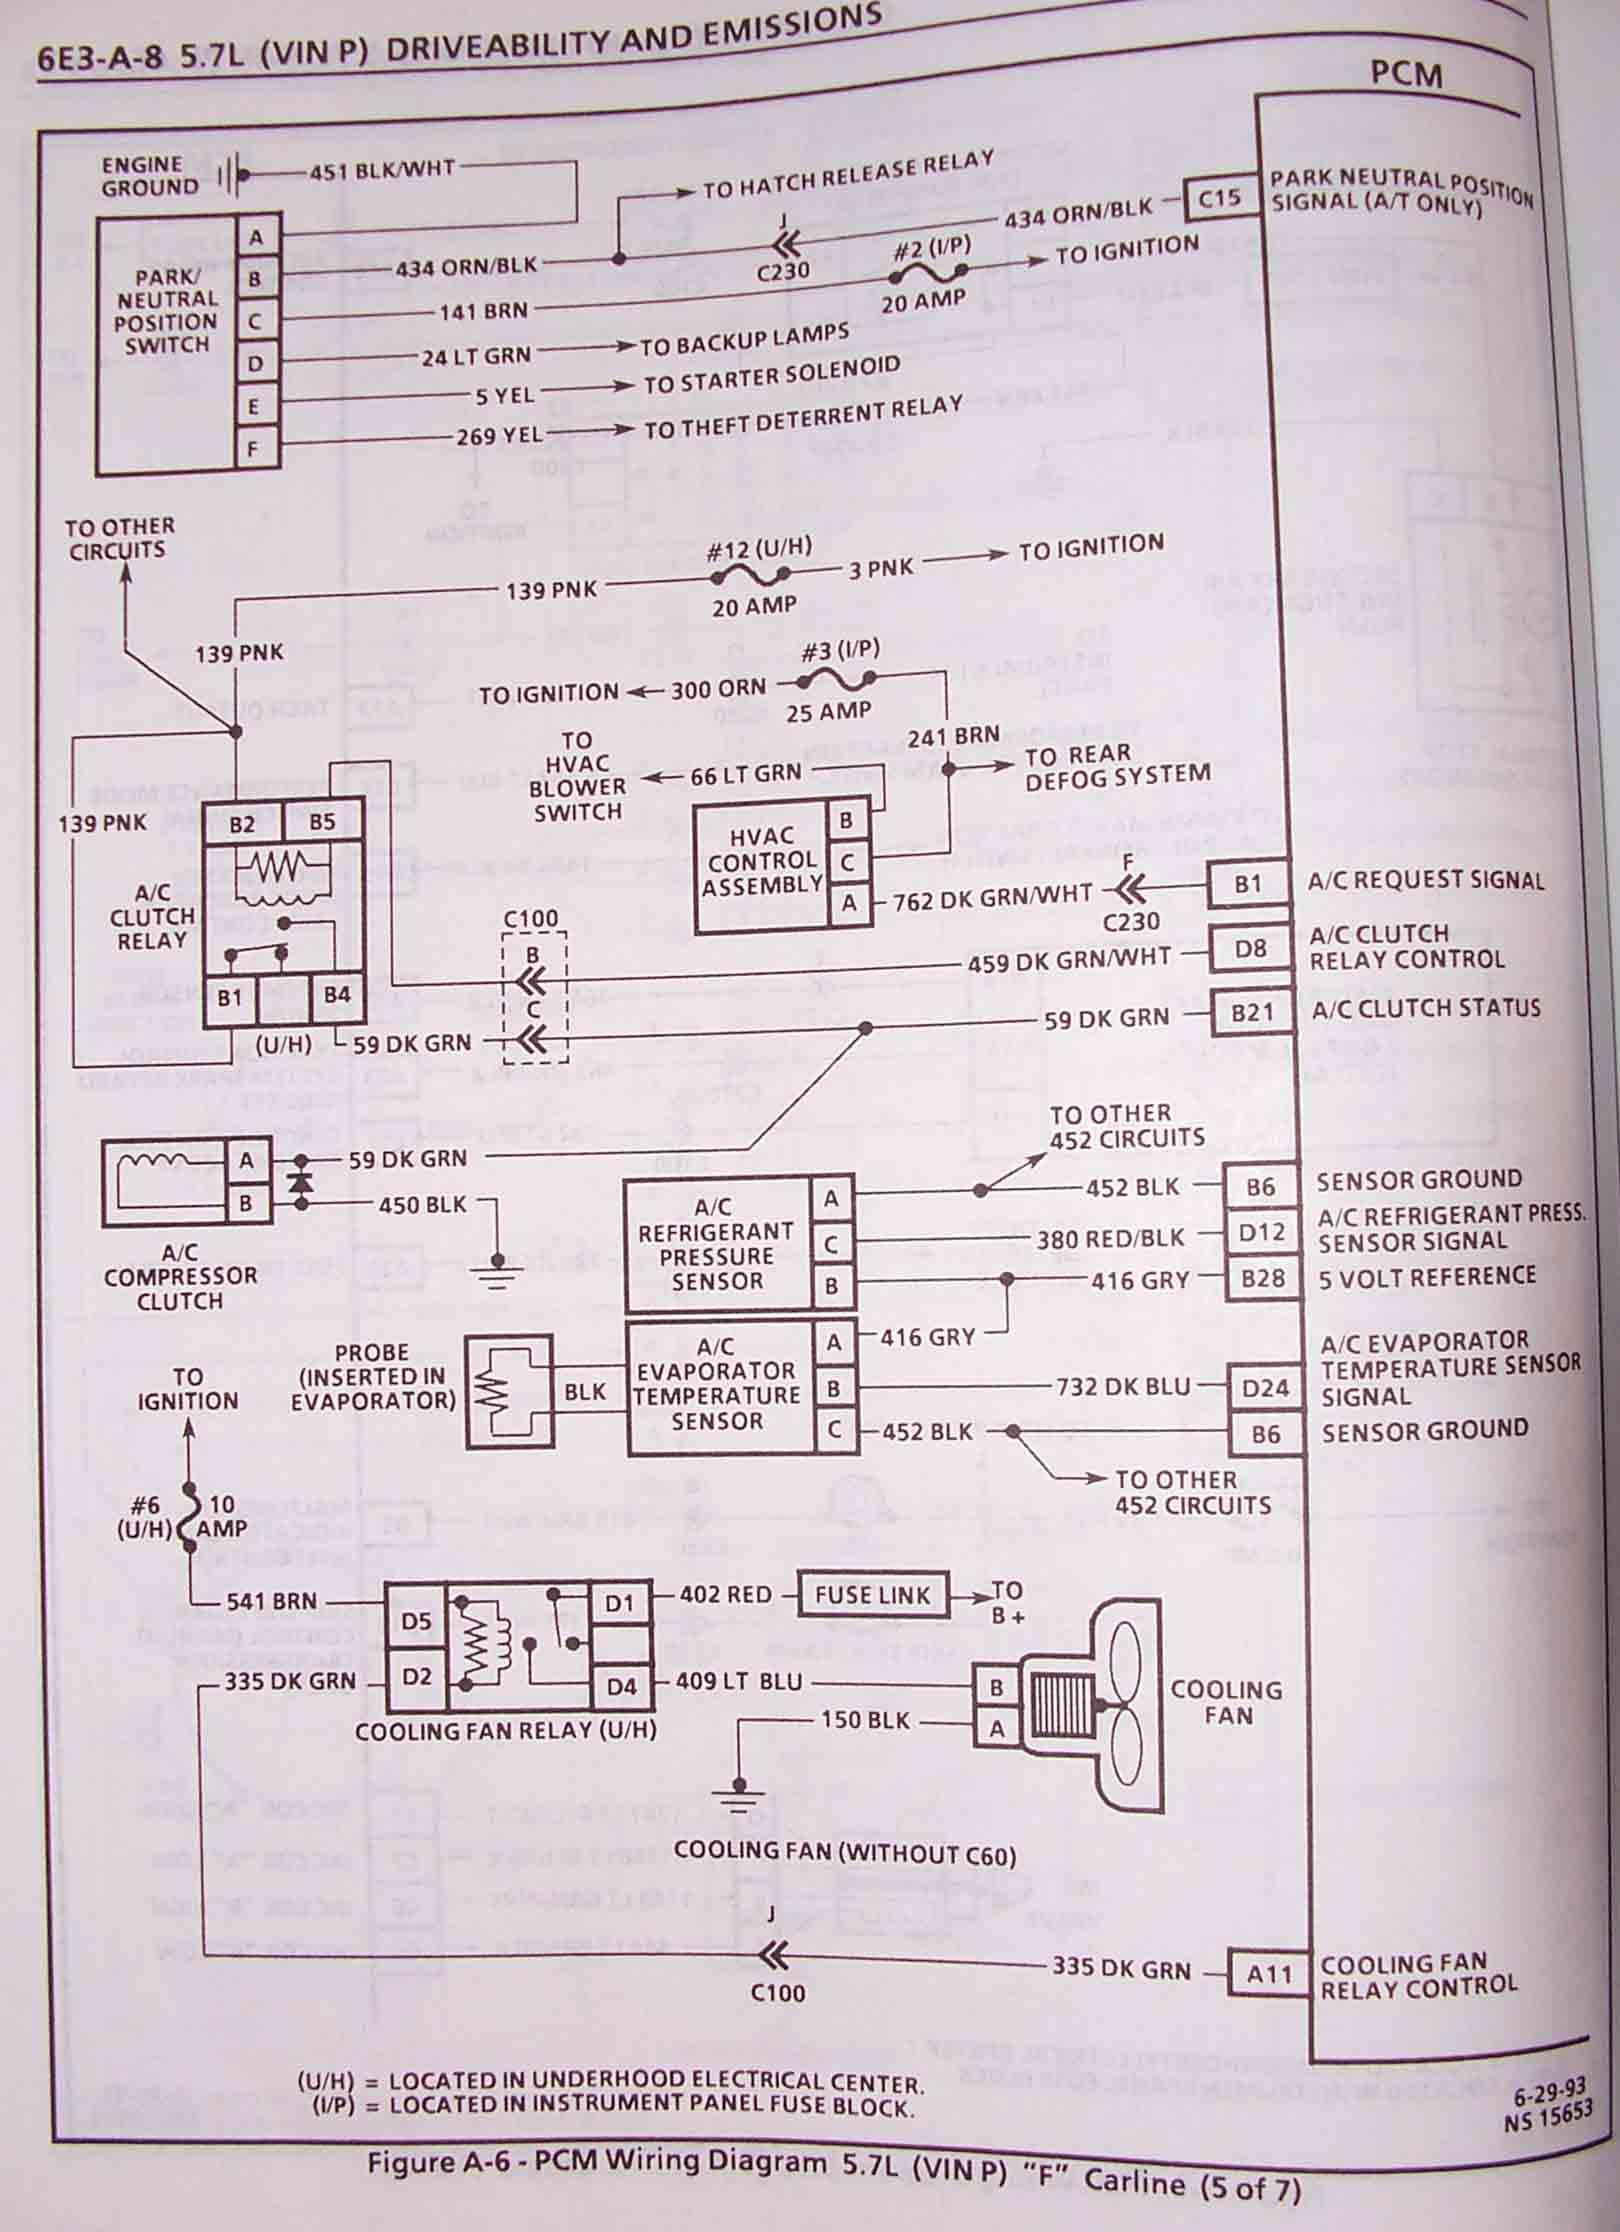 94 lt1 pcm wiring diagram